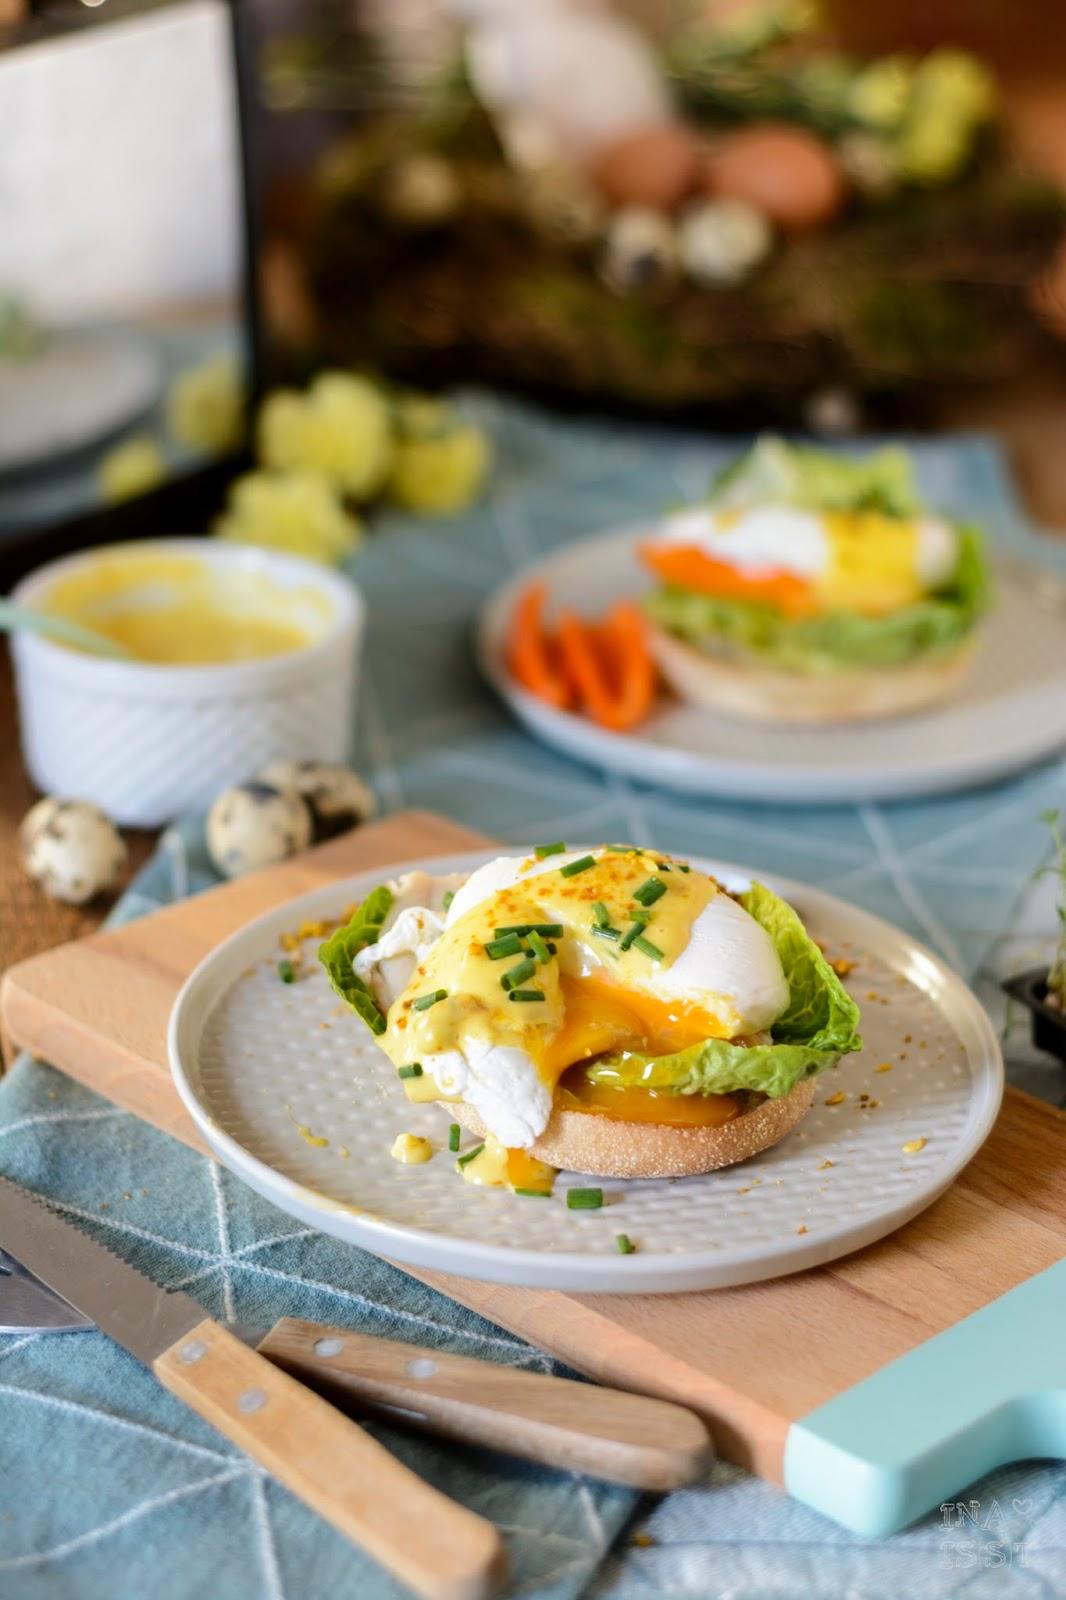 Eggs Benedict mit geräucherter Forelle und würziger Sauce Hollandaise à la Franz Hose, Ina Is(s)t, Dipster